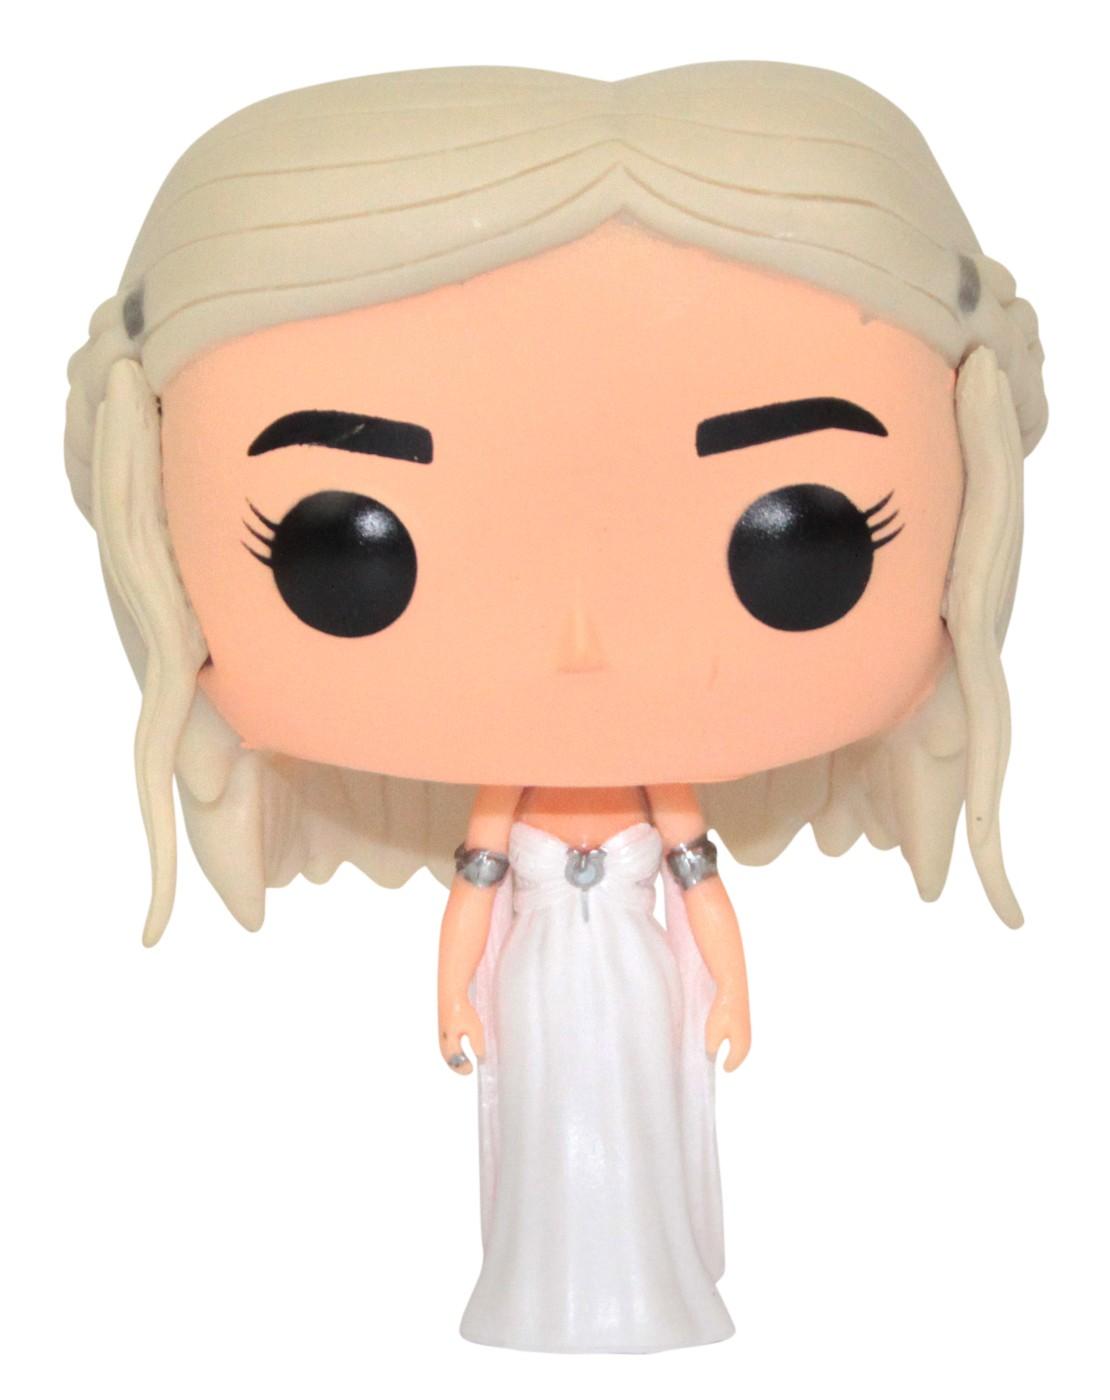 Game Of Thrones Daenerys Targaryen In Wedding Gown Pop